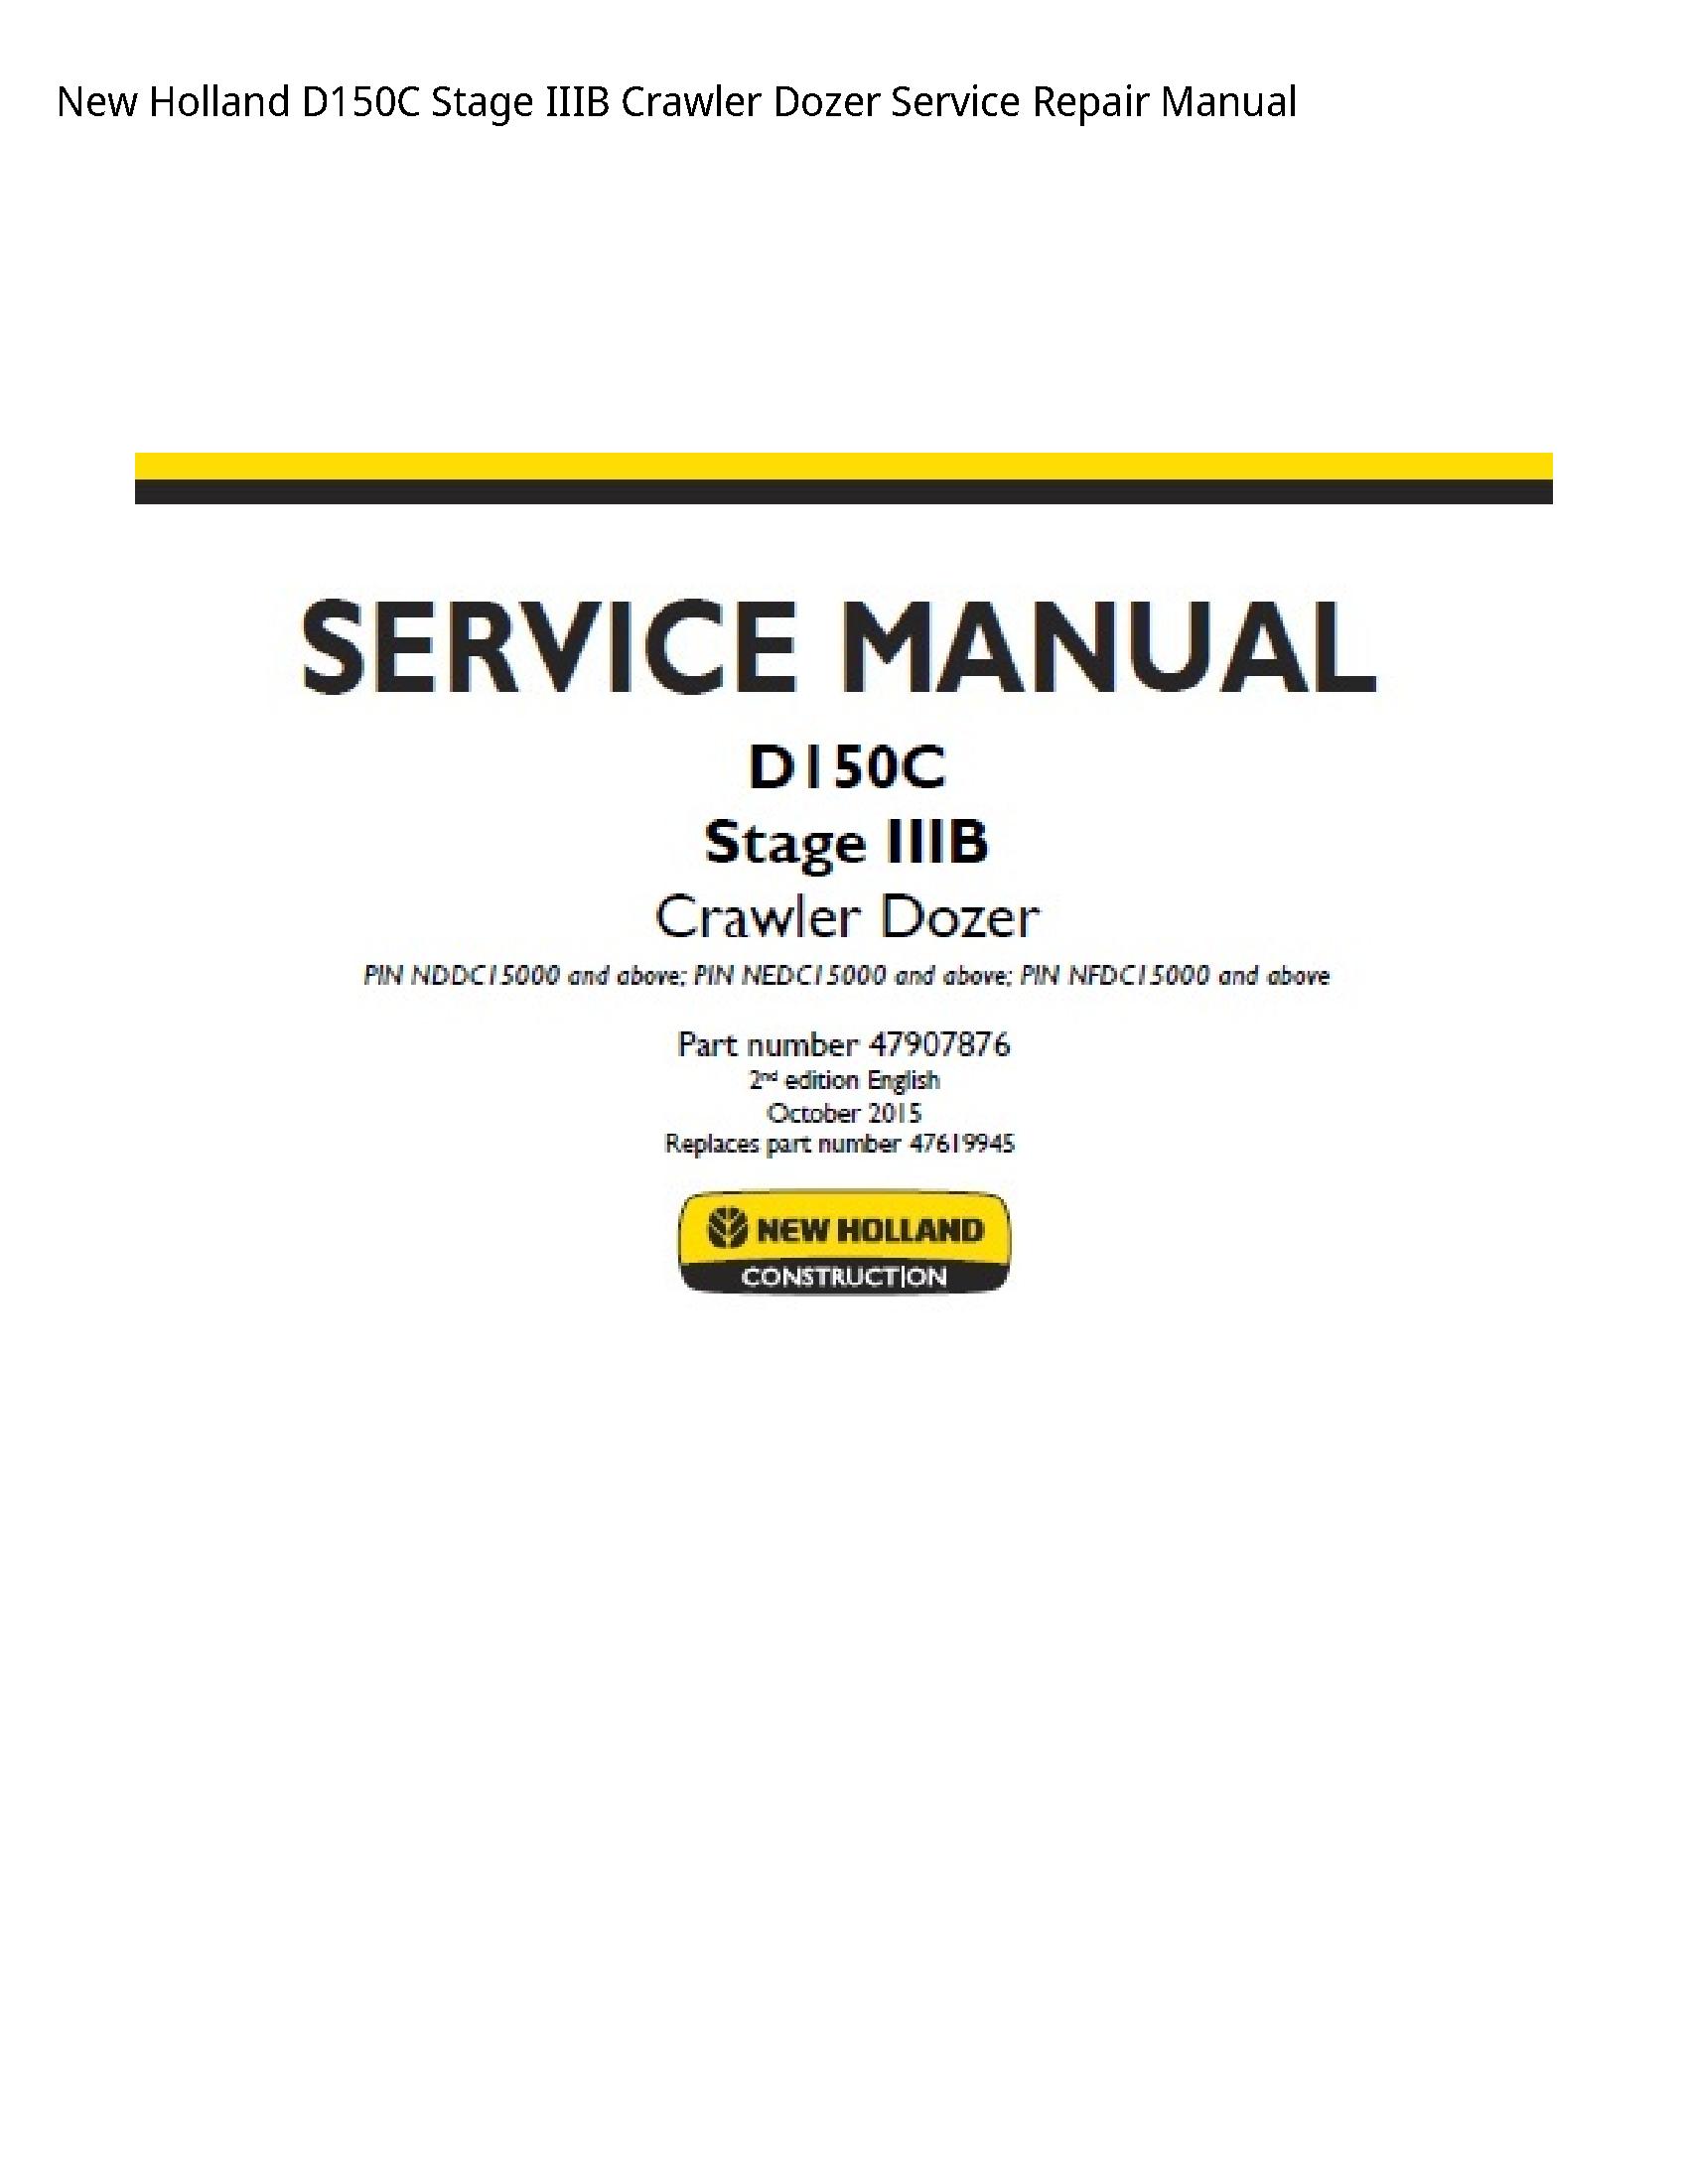 New Holland D150C Stage IIIB Crawler Dozer manual